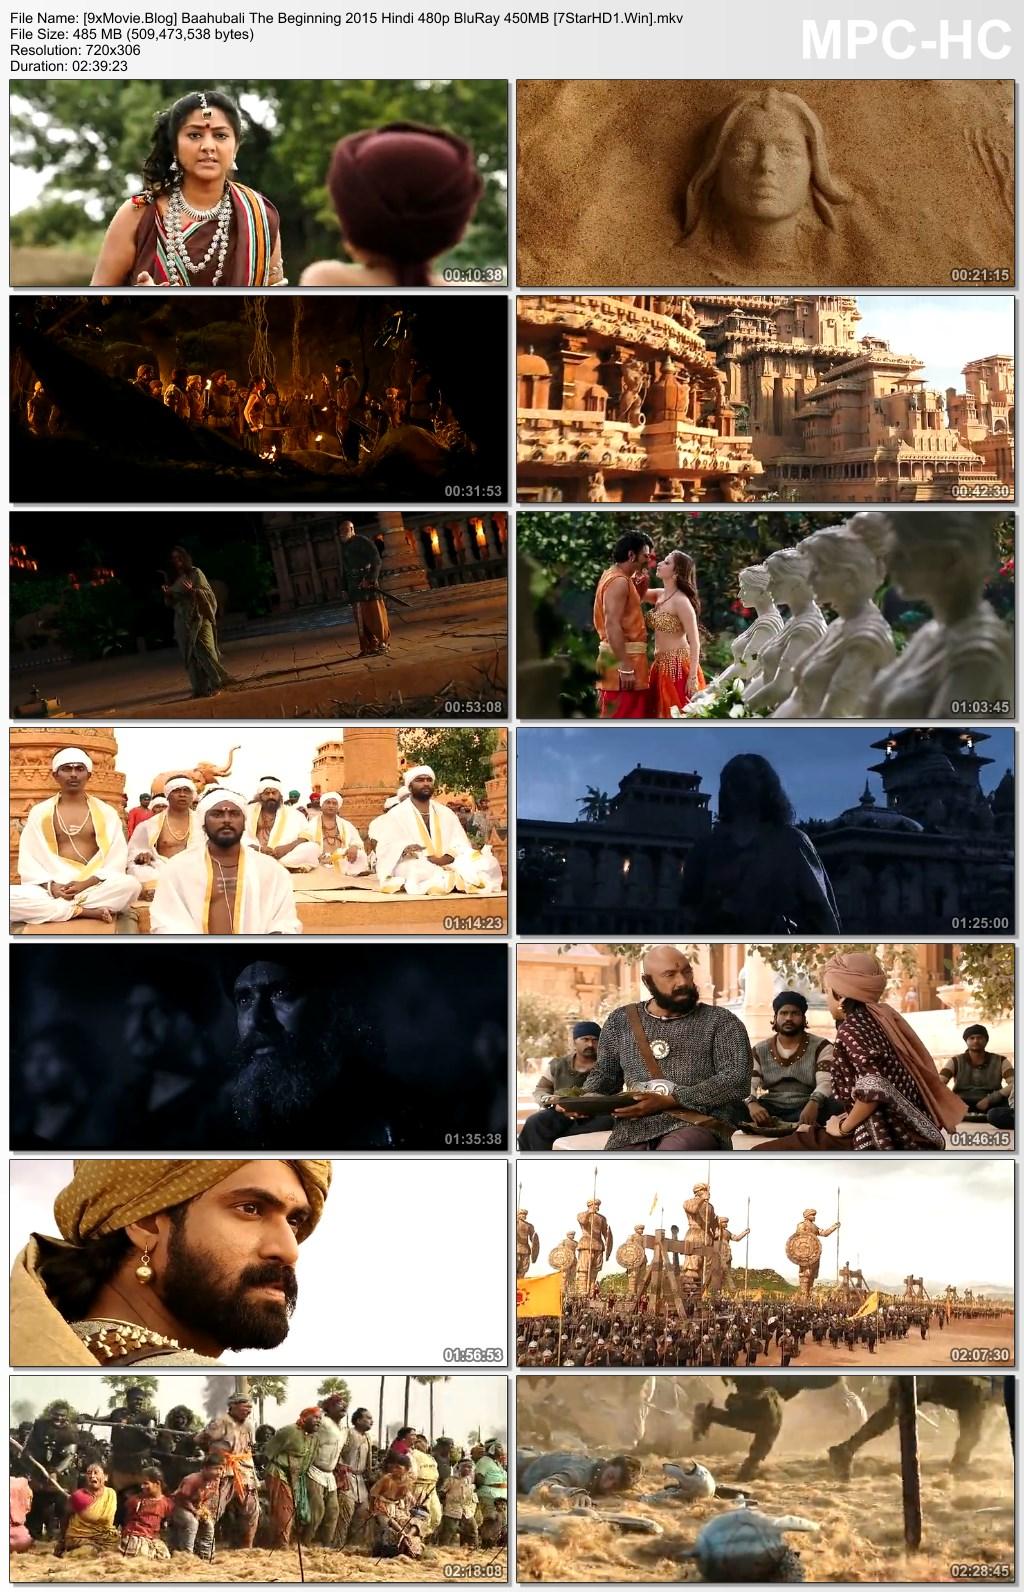 Baahubali The Beginning 2015 Hindi 480p BluRay x264 450MB